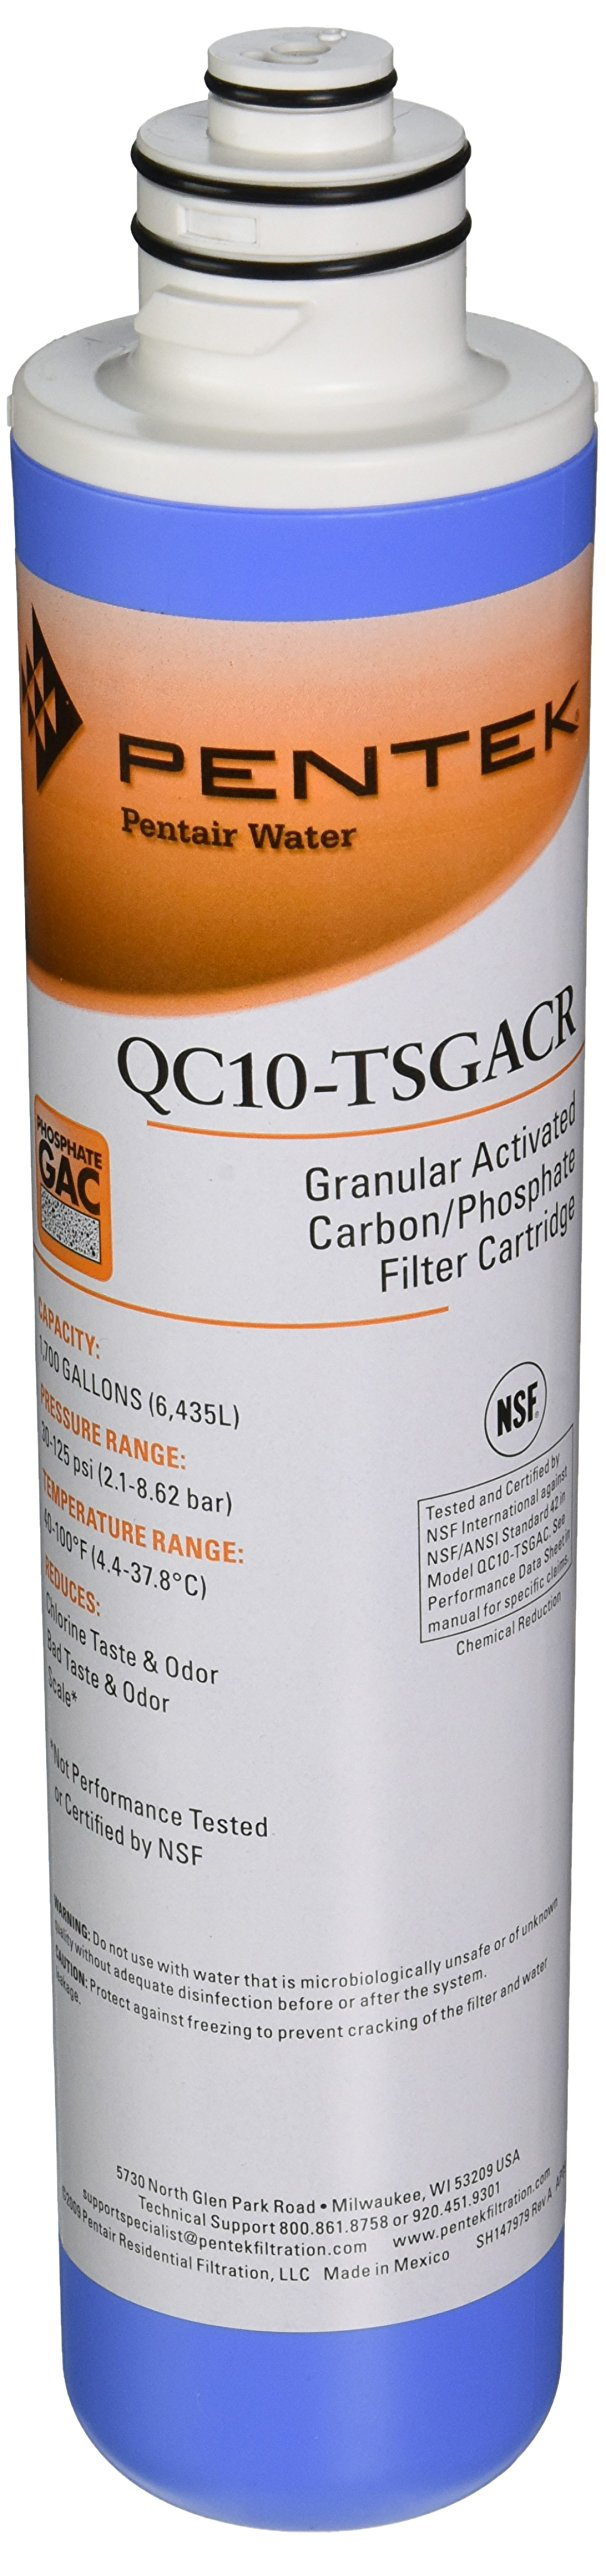 Pentek QC10-TSGACR Undersink Quick-Change Replacement Filter Cartridge by Pentek